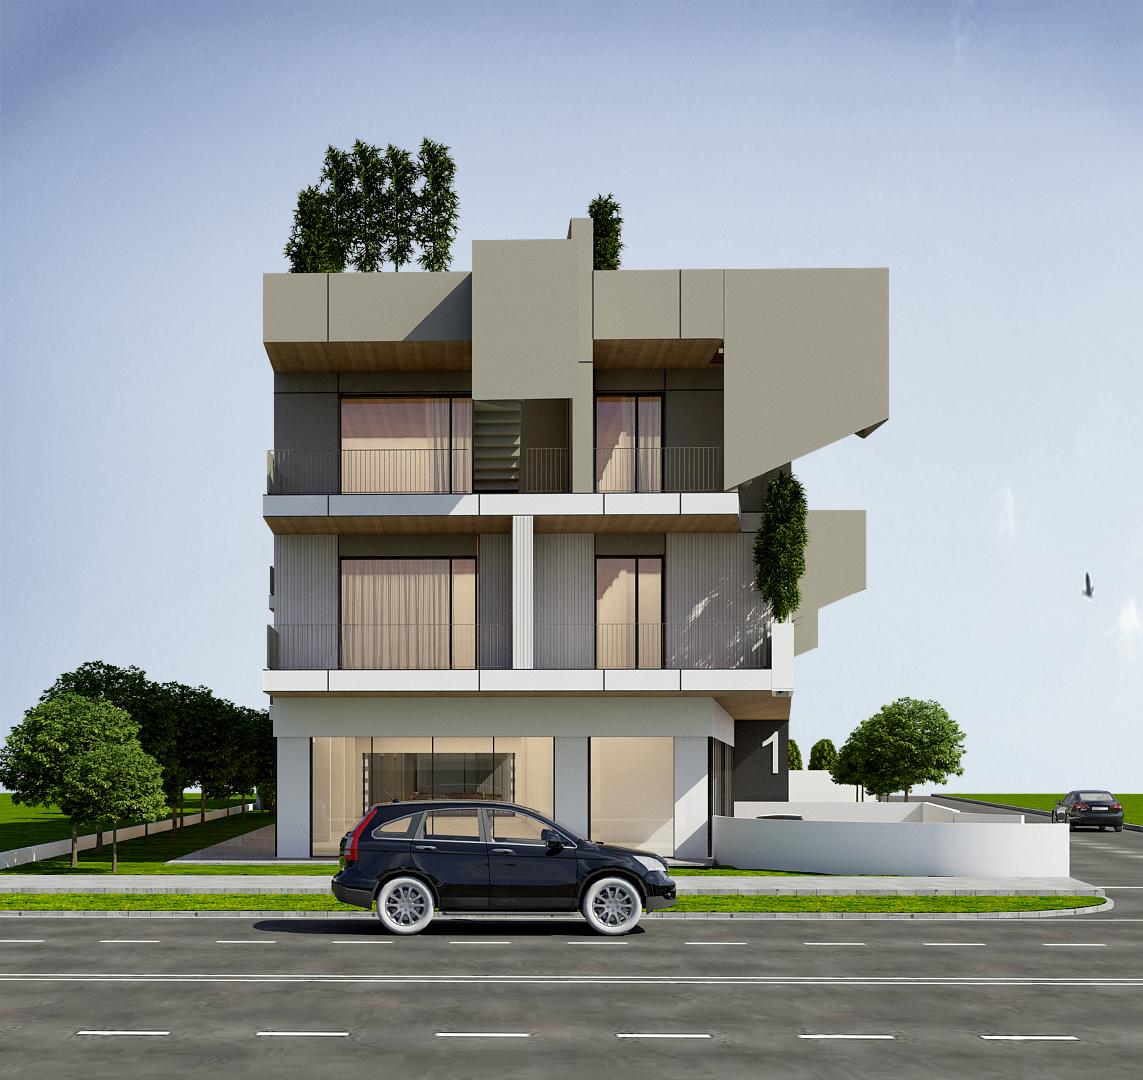 https://nbc-arhitect.ro/wp-content/uploads/2021/09/Coralilor-MASTER-6.jpg